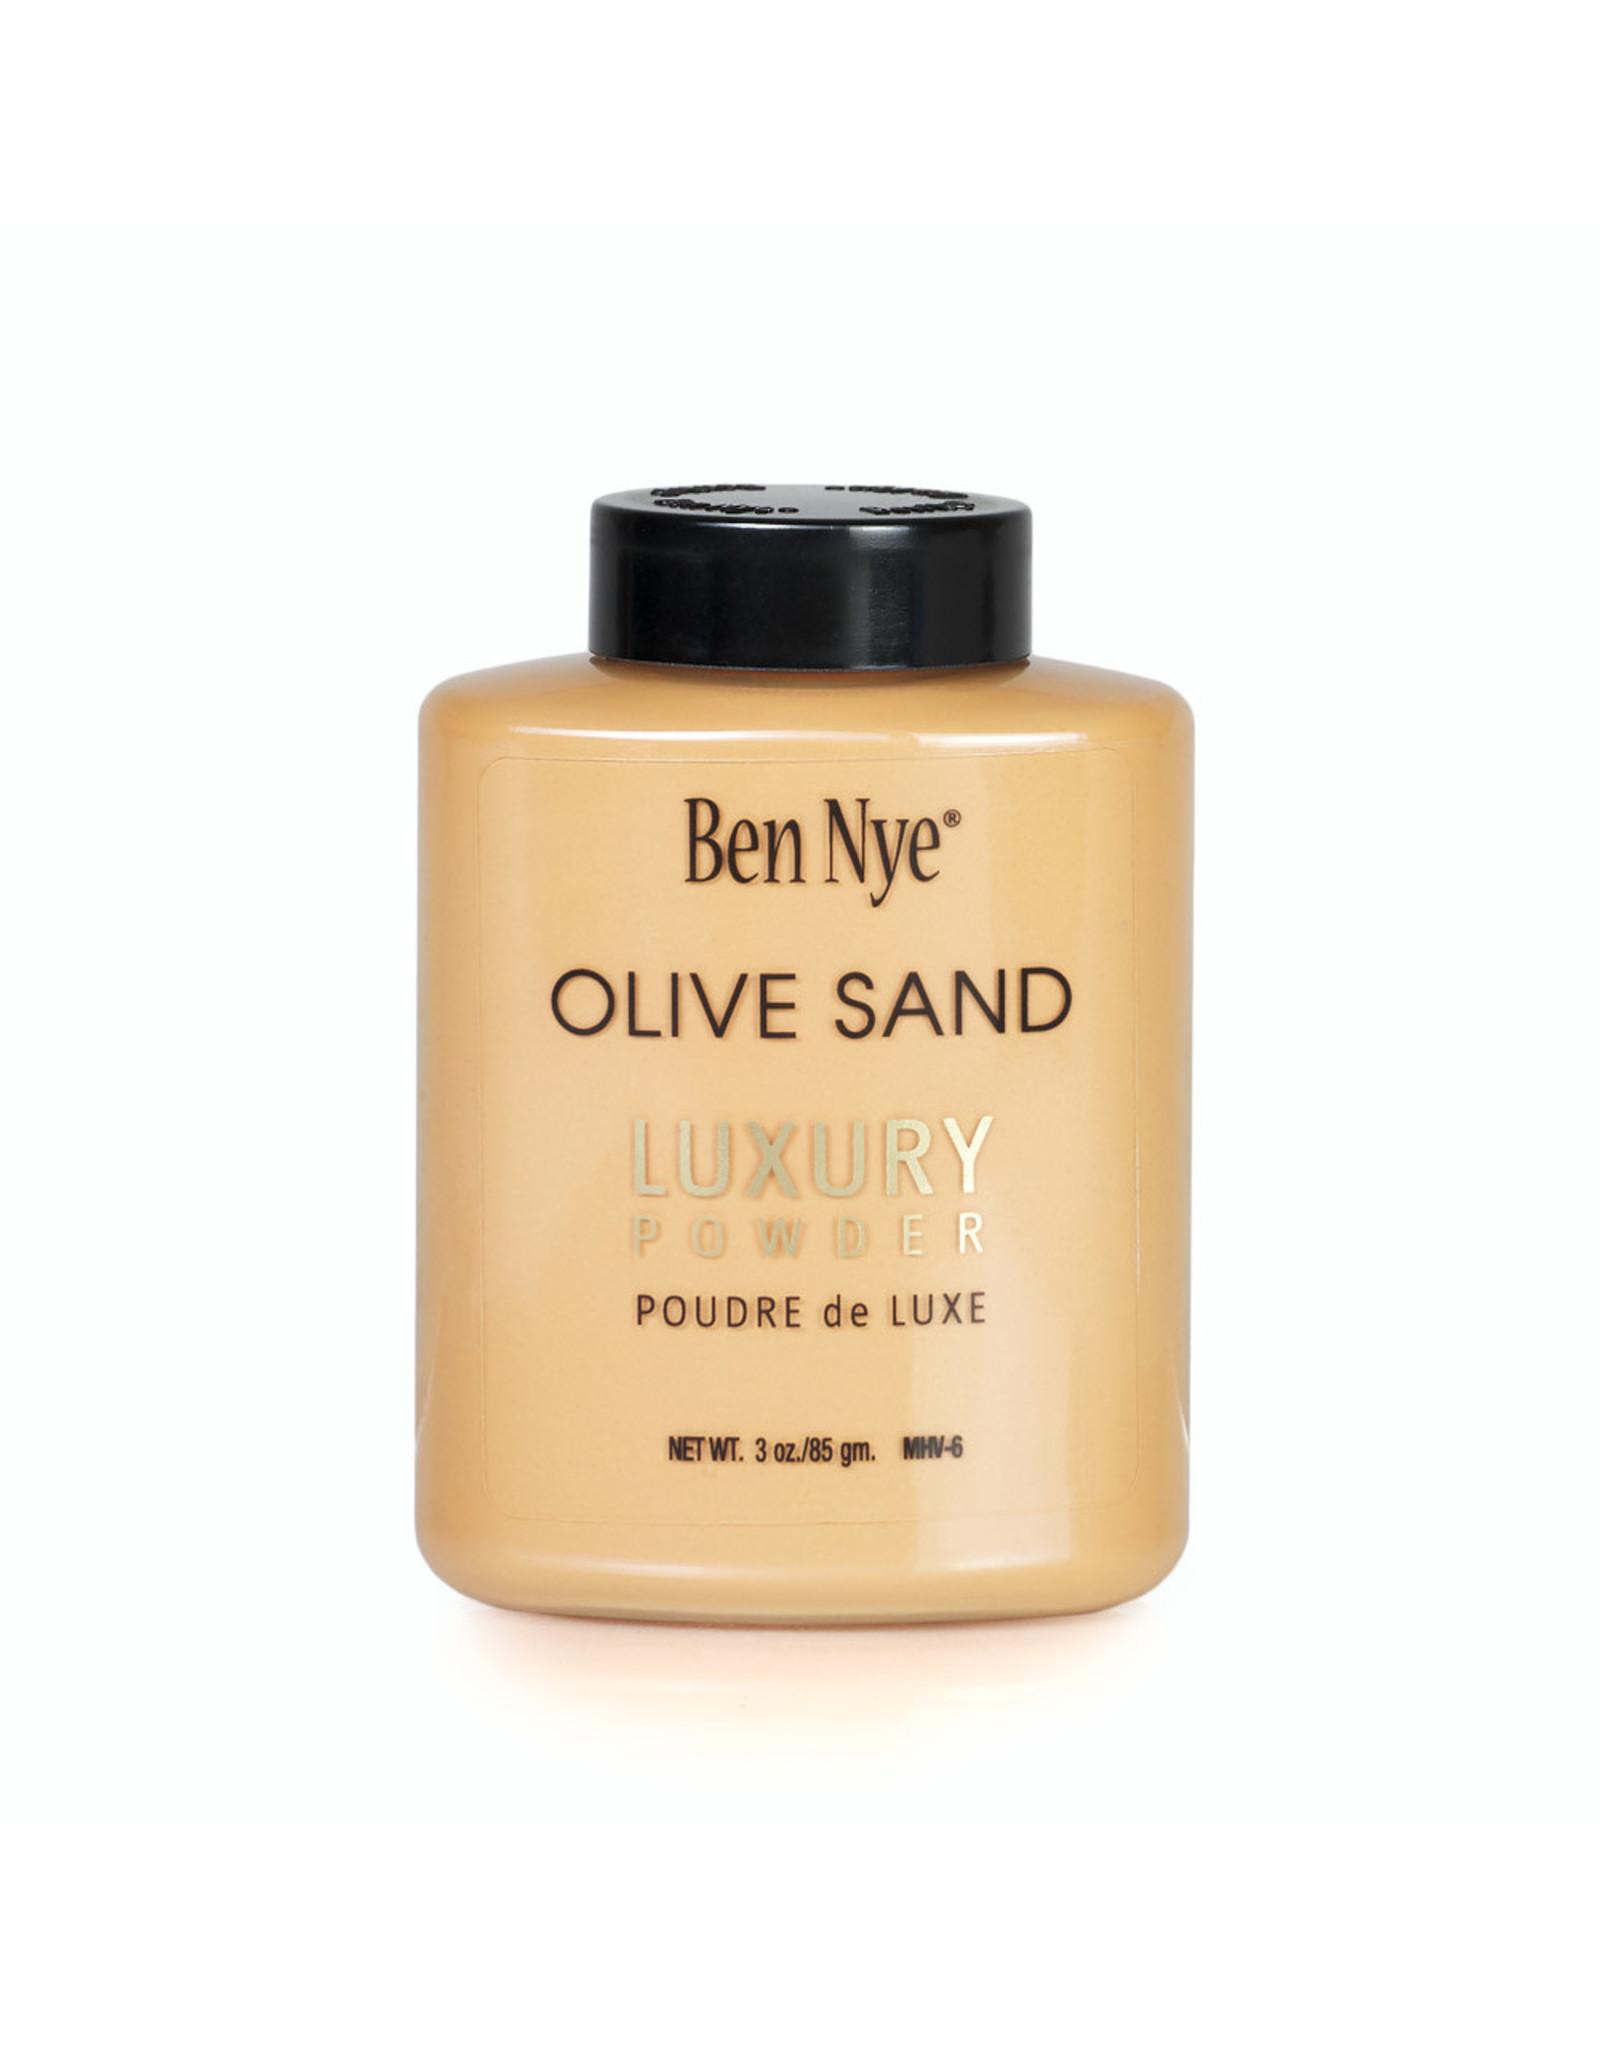 Ben Nye Ben Nye Olive Sand Luxury Powder